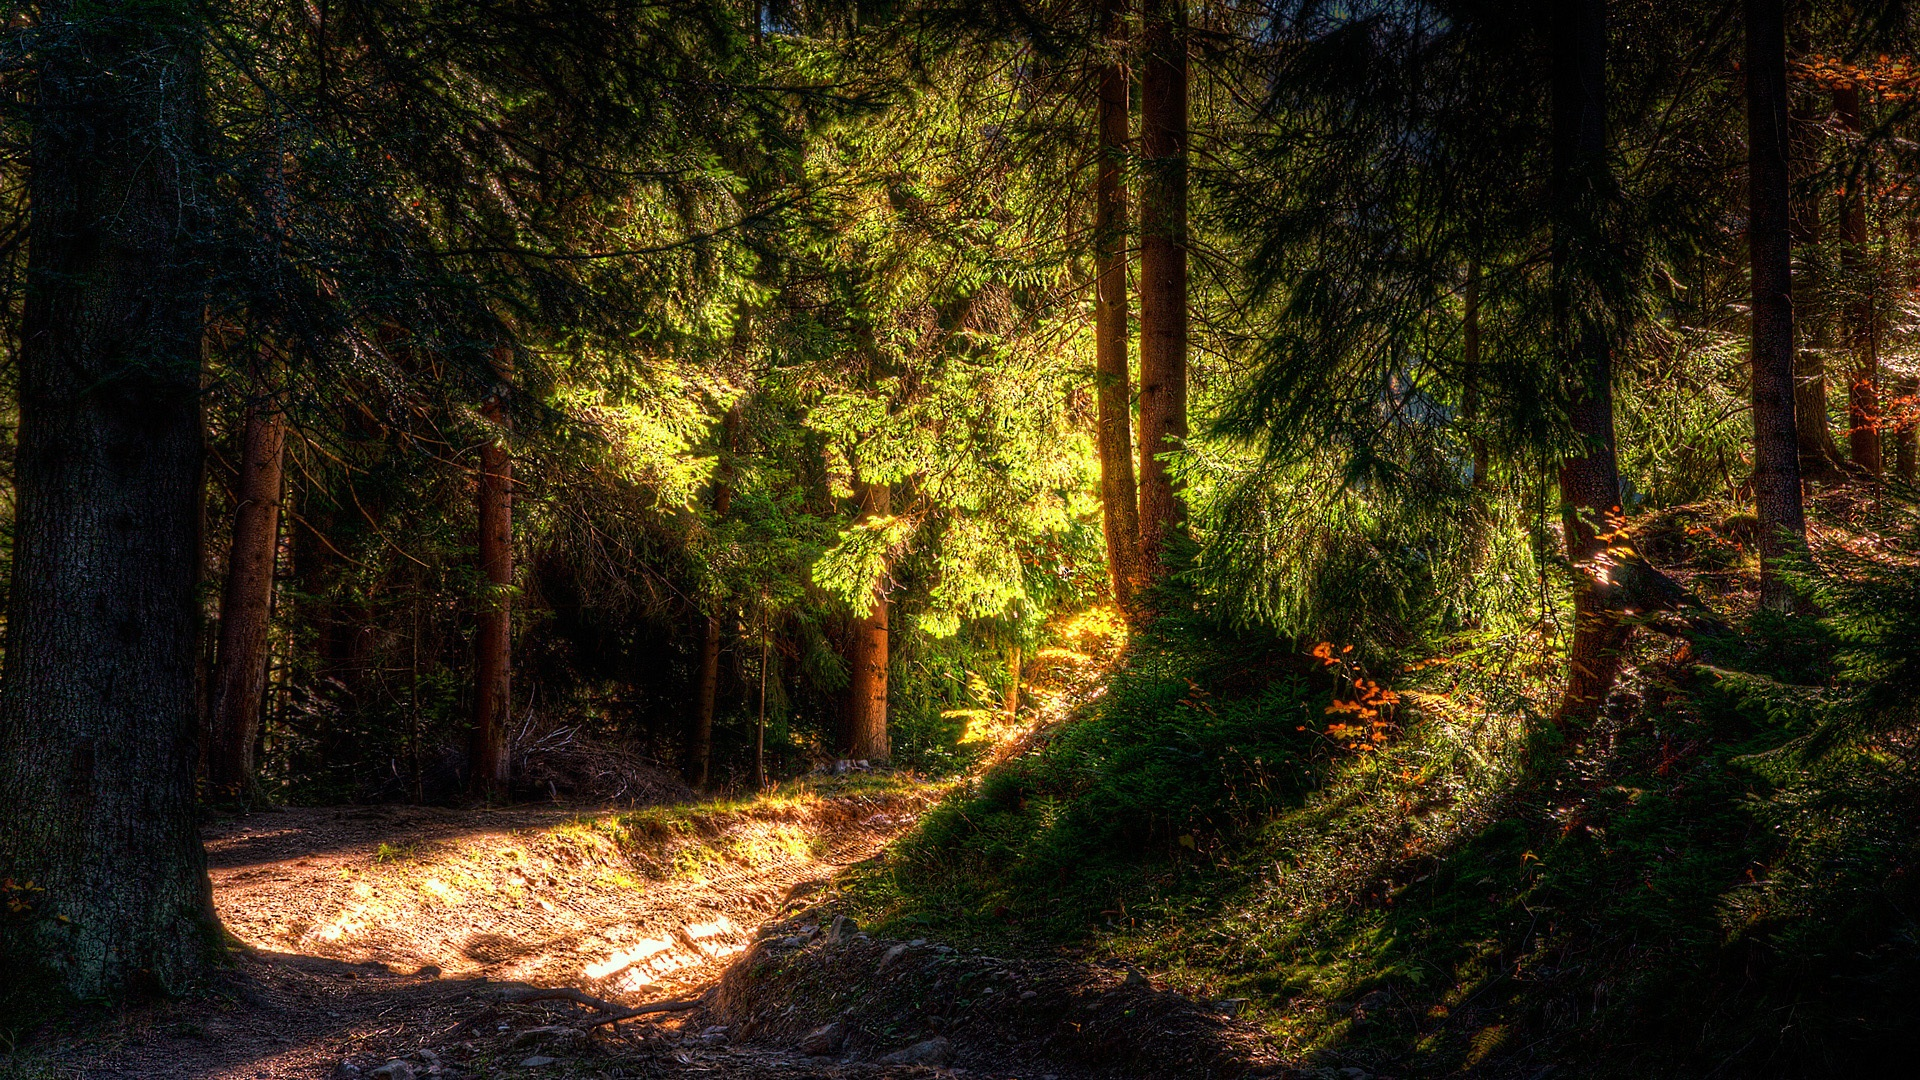 Full hd nature wallpaper nature hd wallpapers | ImgStocks.com